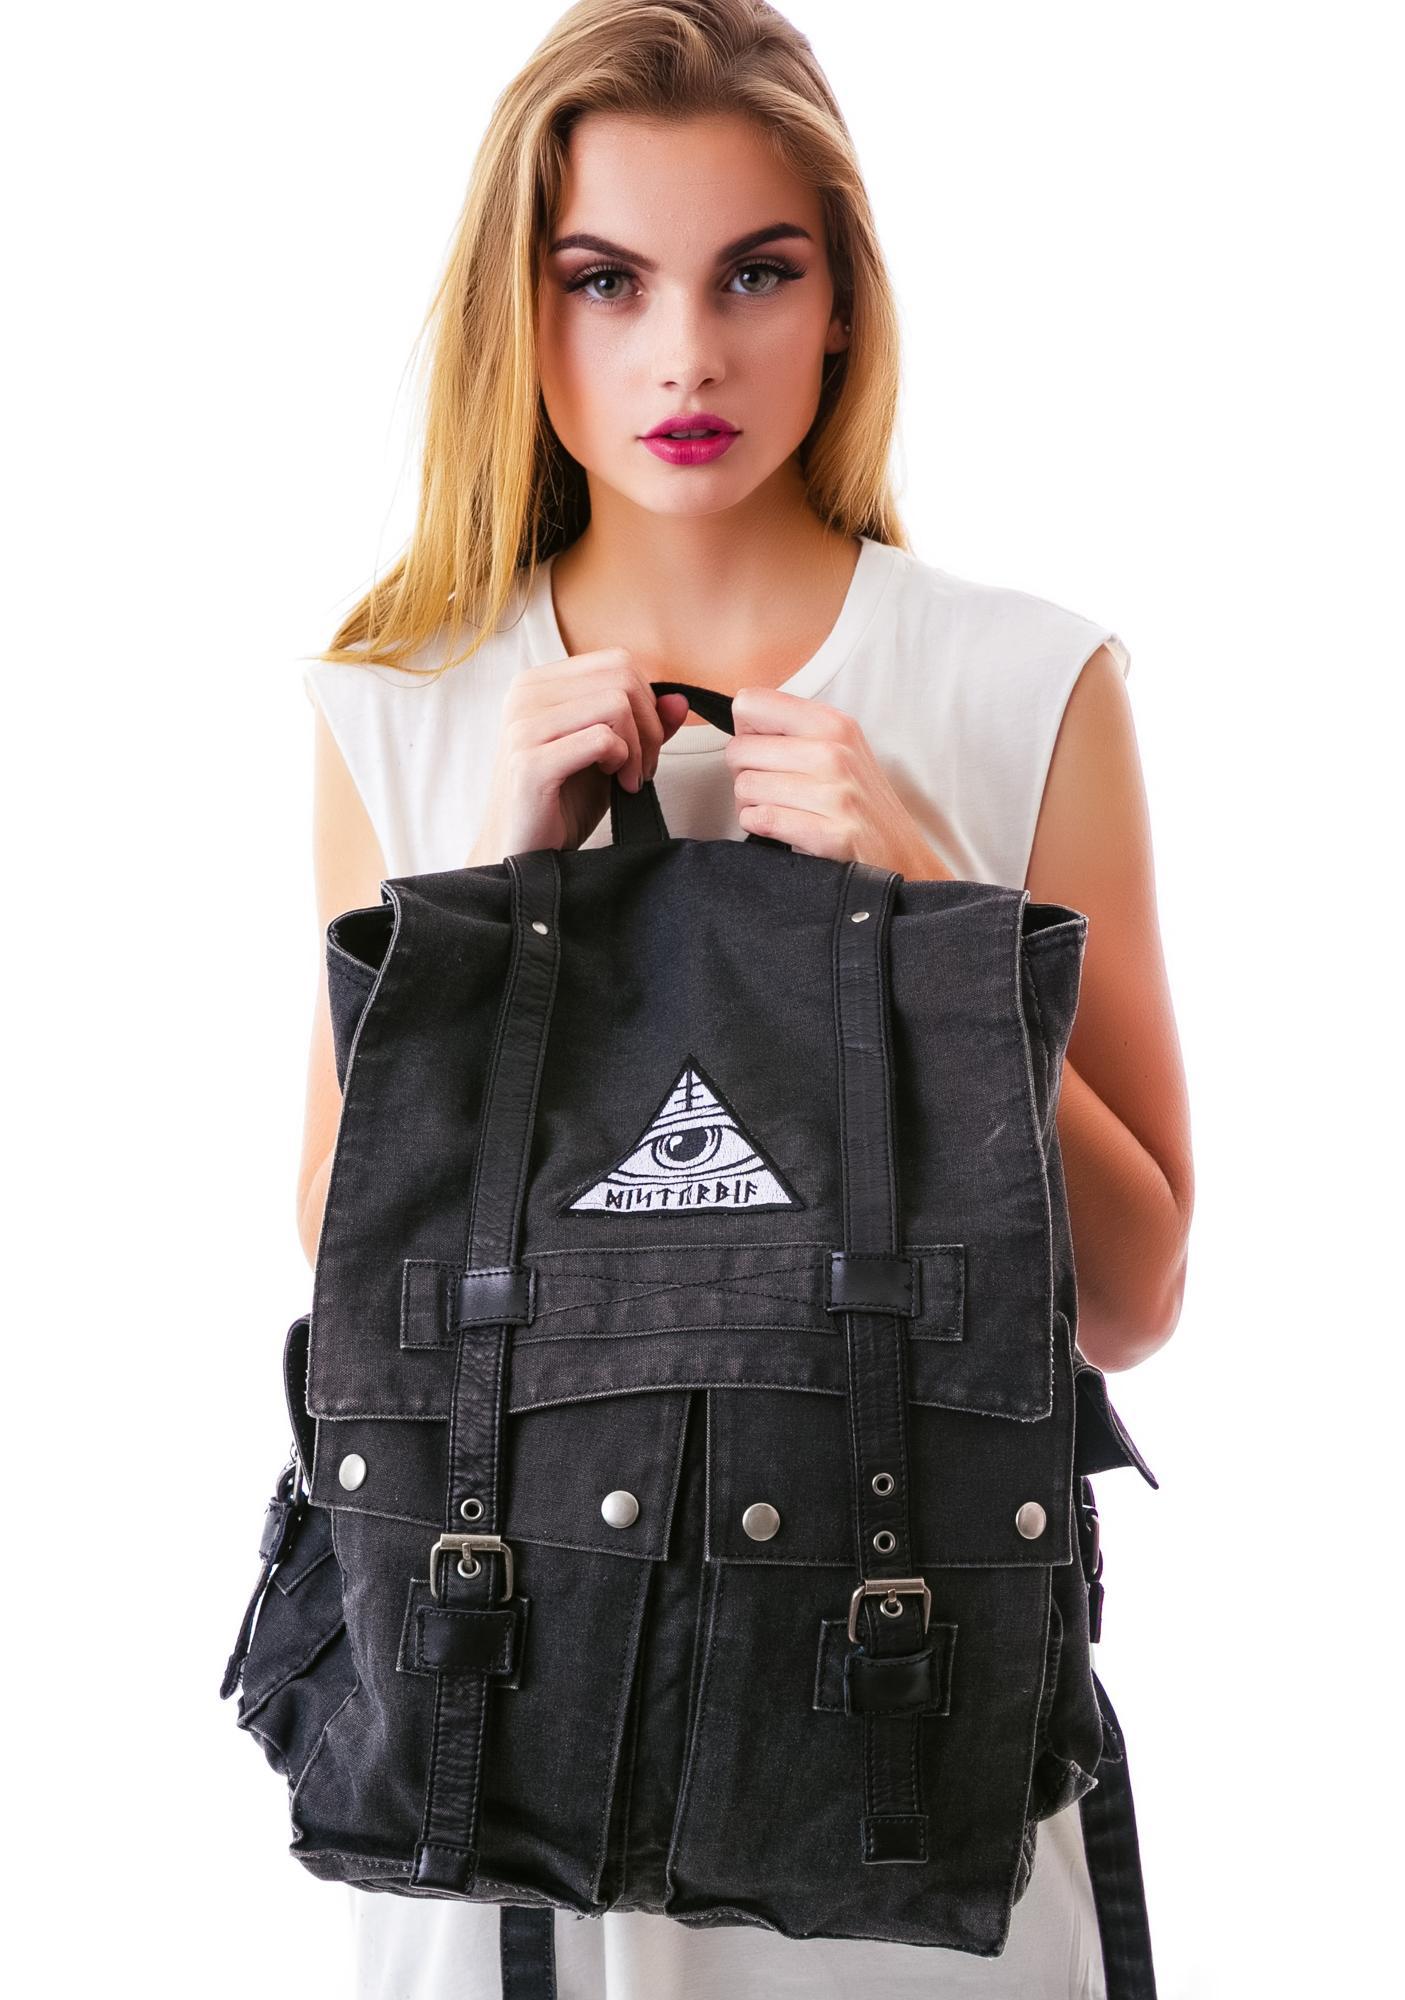 Disturbia All Seeing Backpack